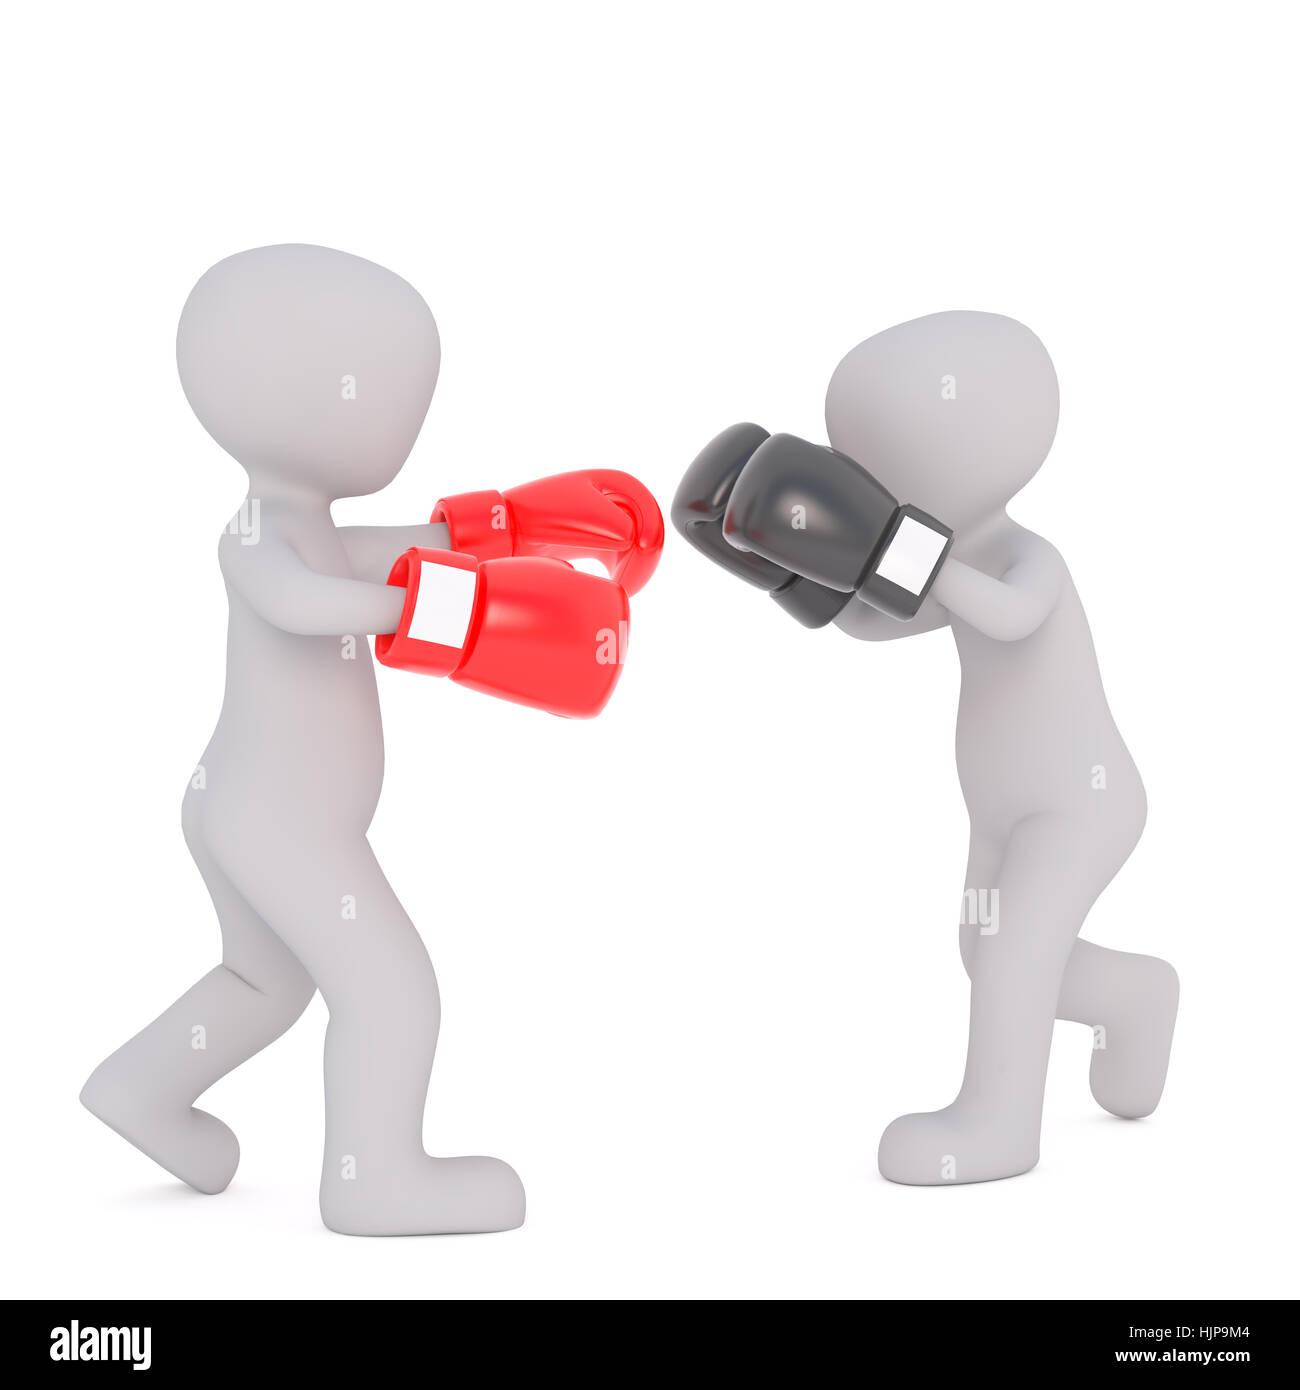 gris genérico dos figuras dibujos animados en 3d usando guantes de